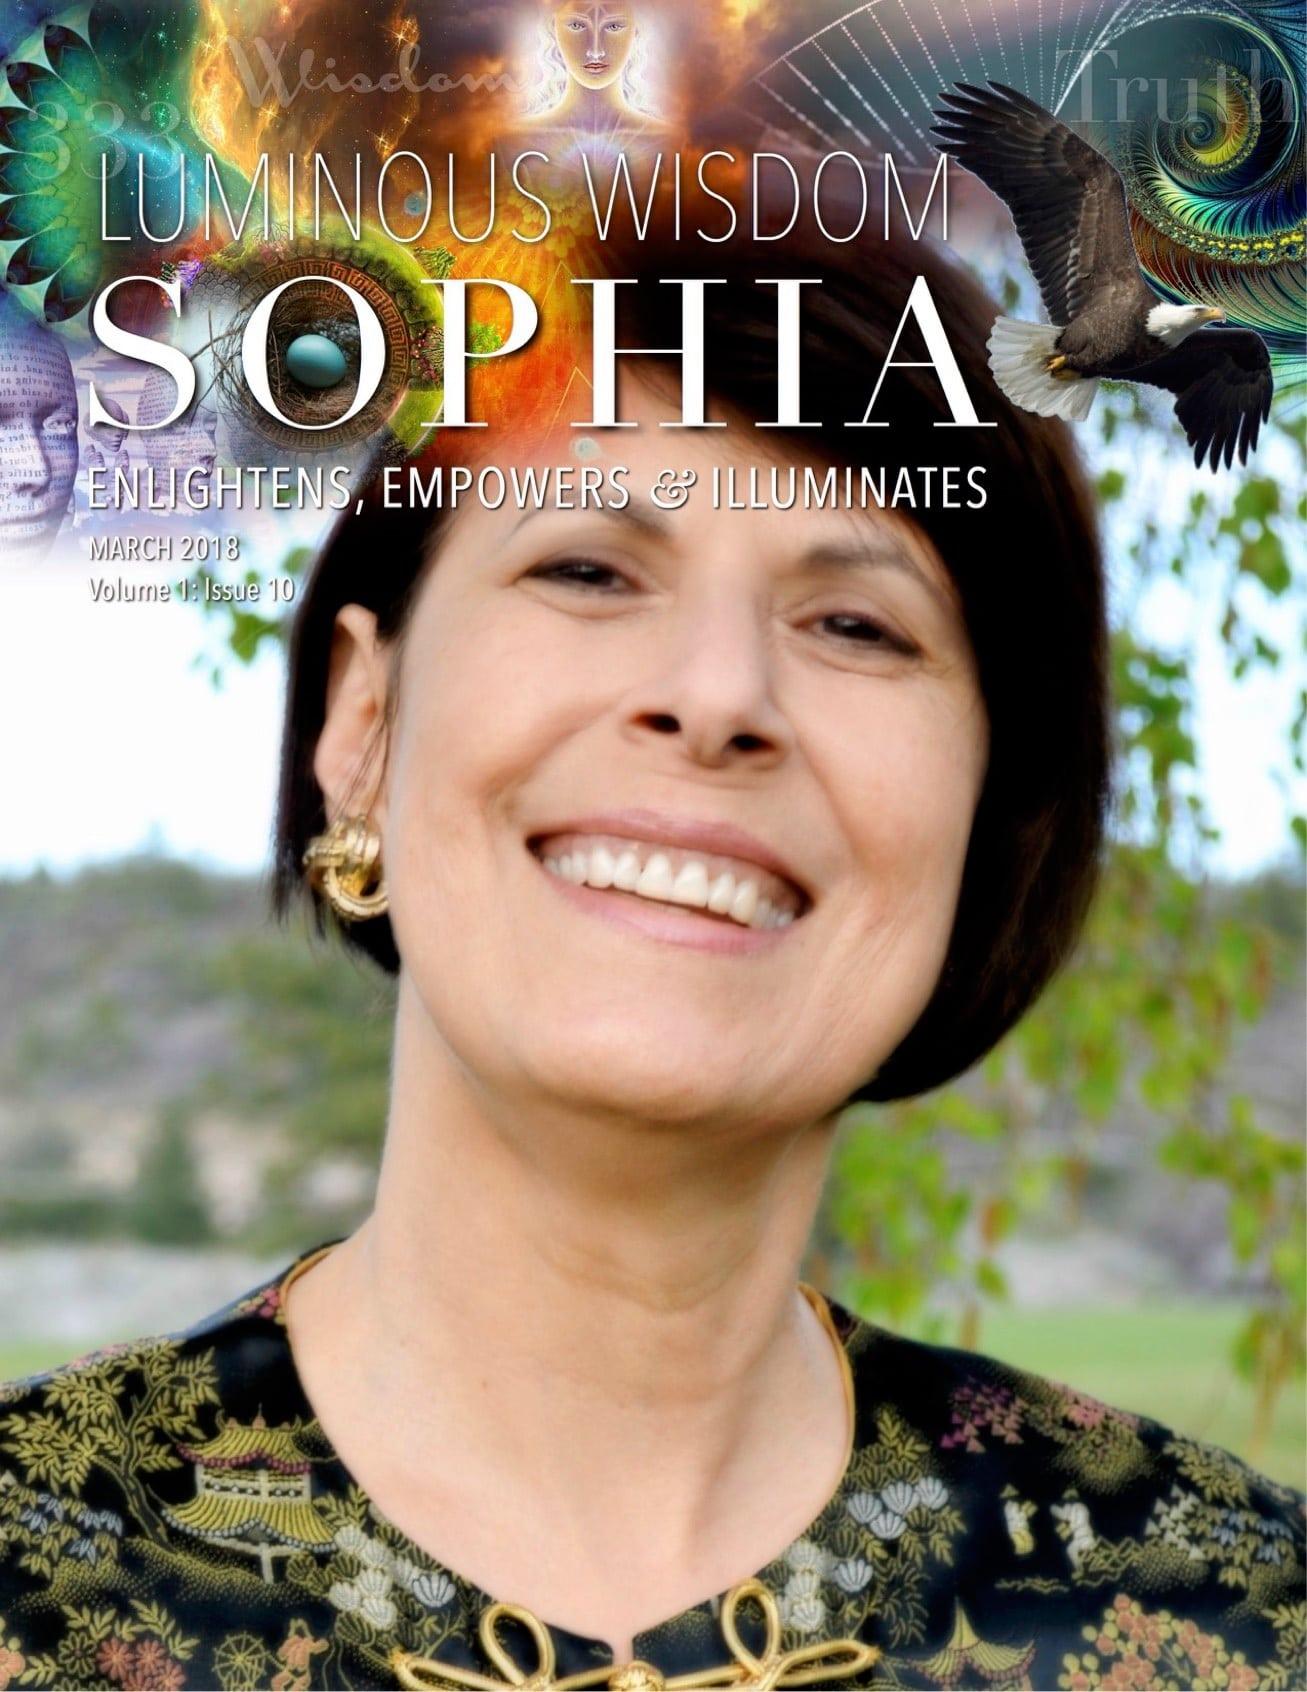 Sophia Jenetta Haim Counselling